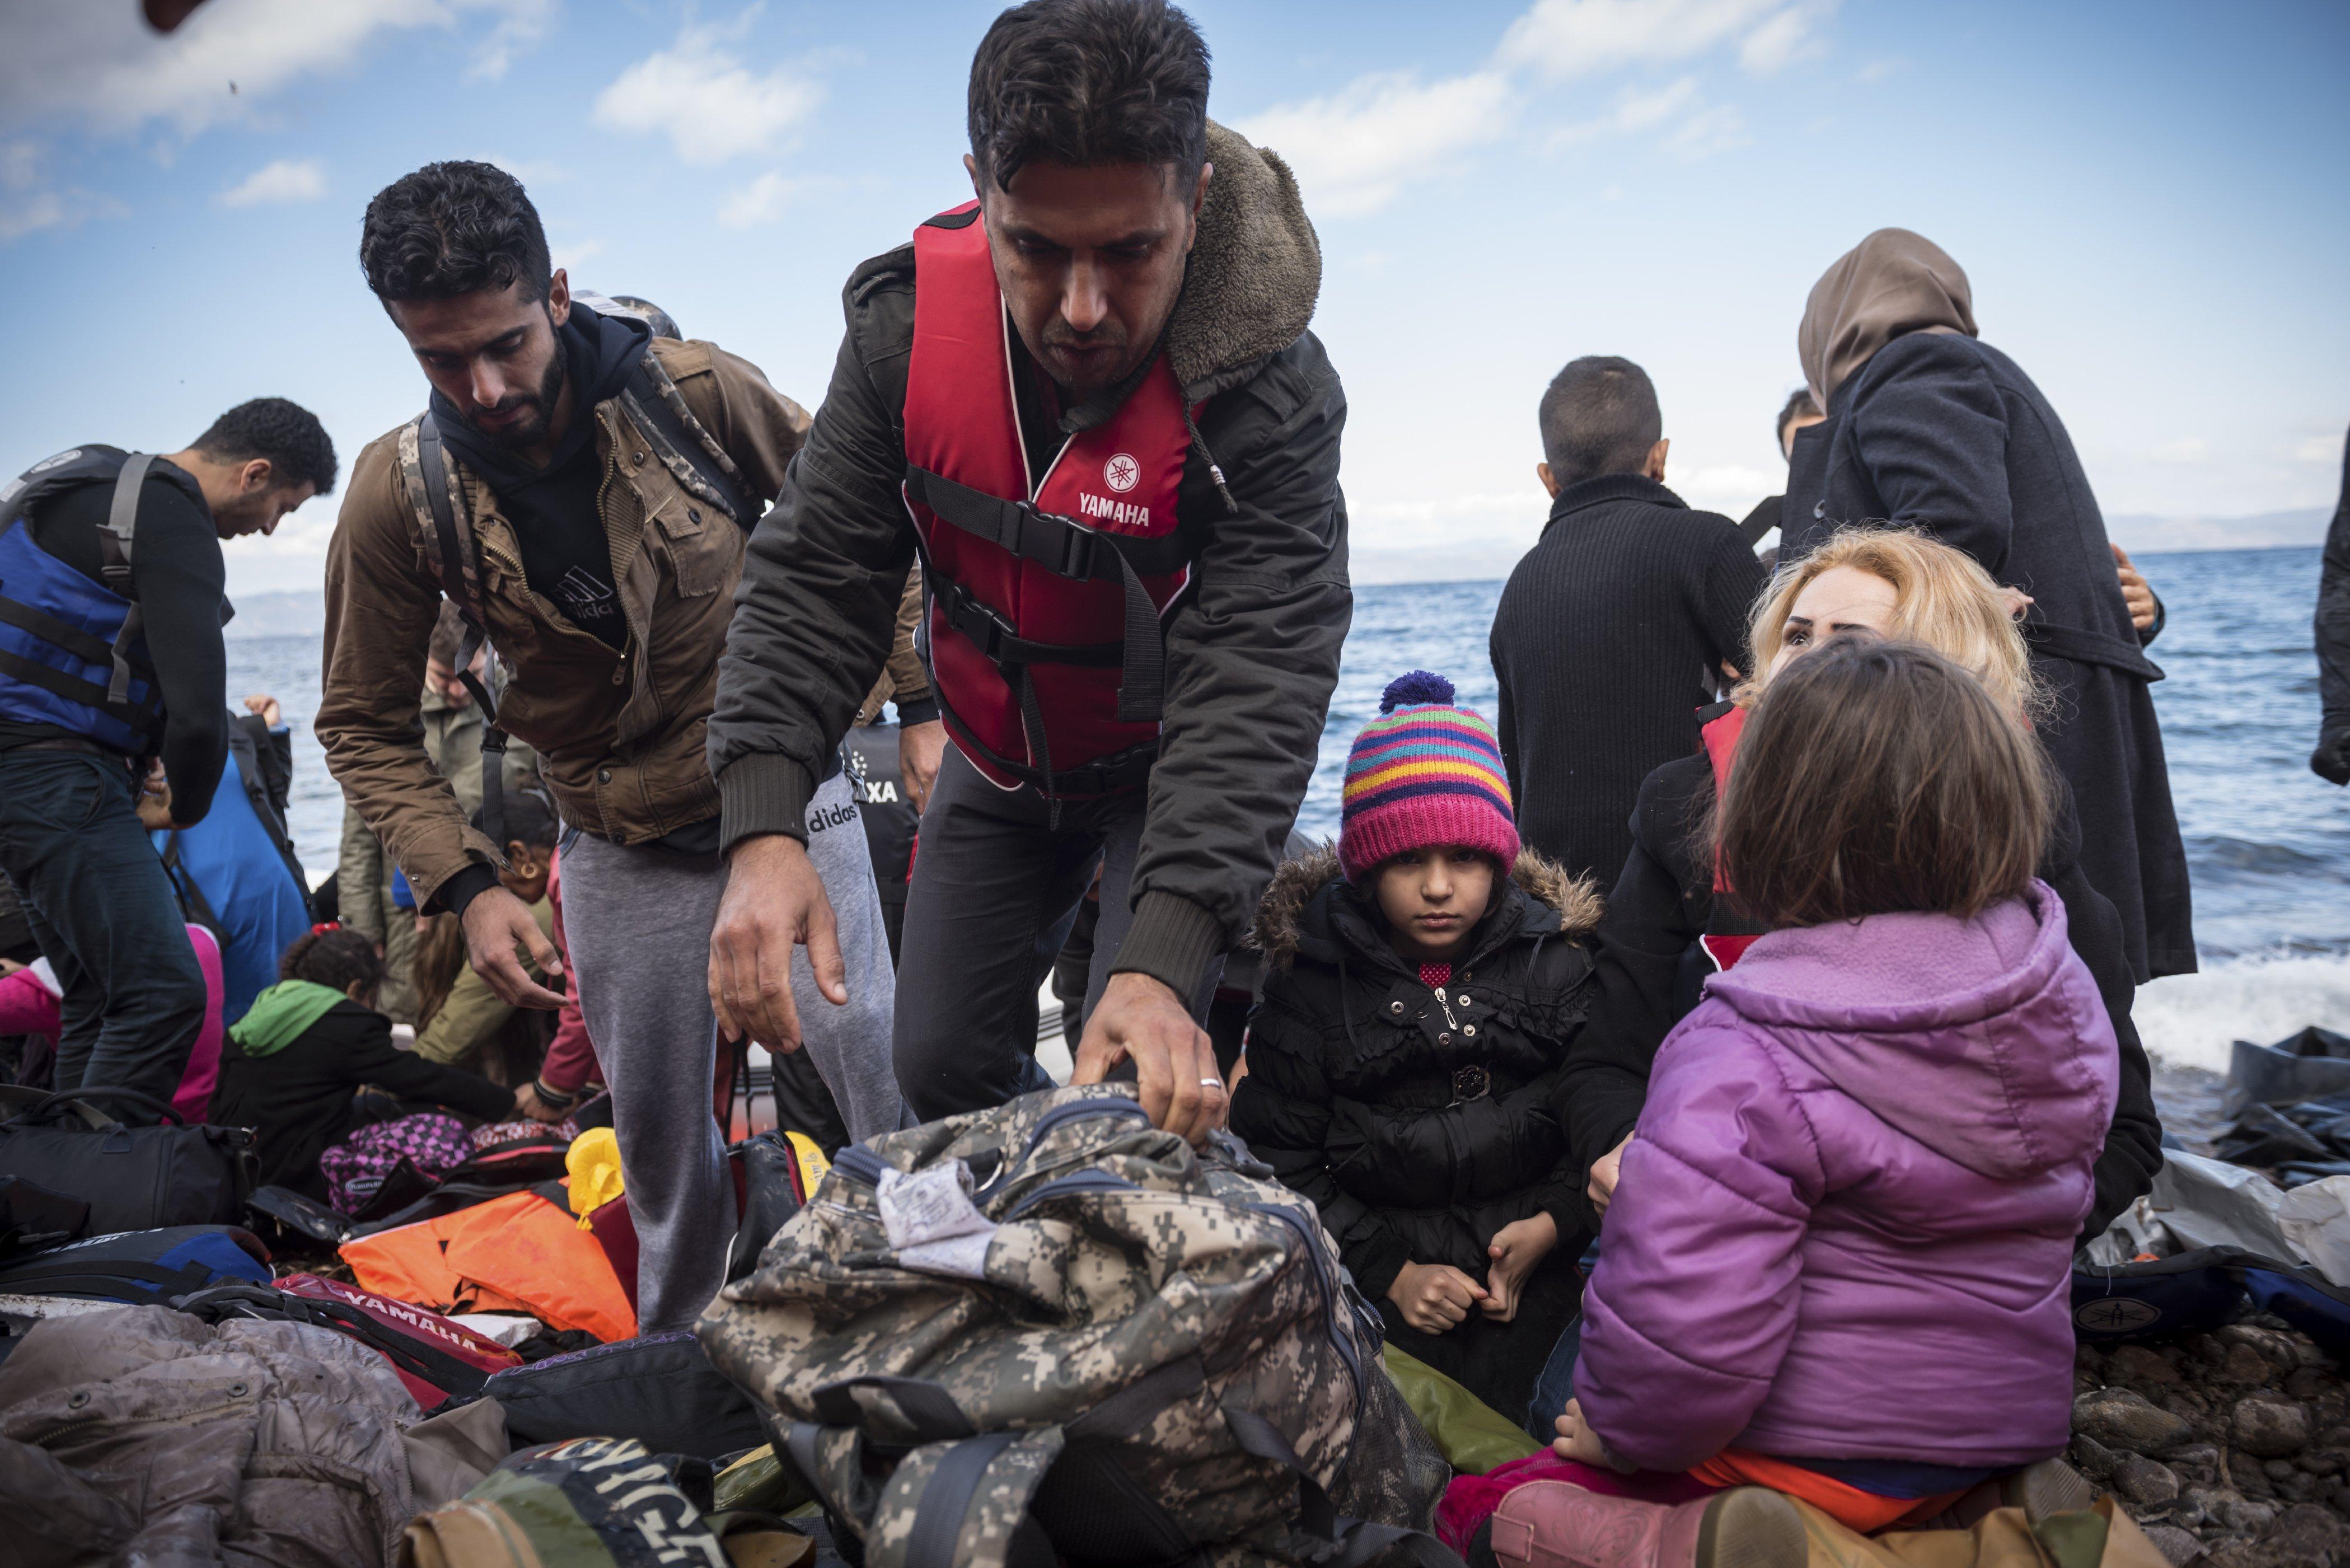 Flüchtlinge Probleme